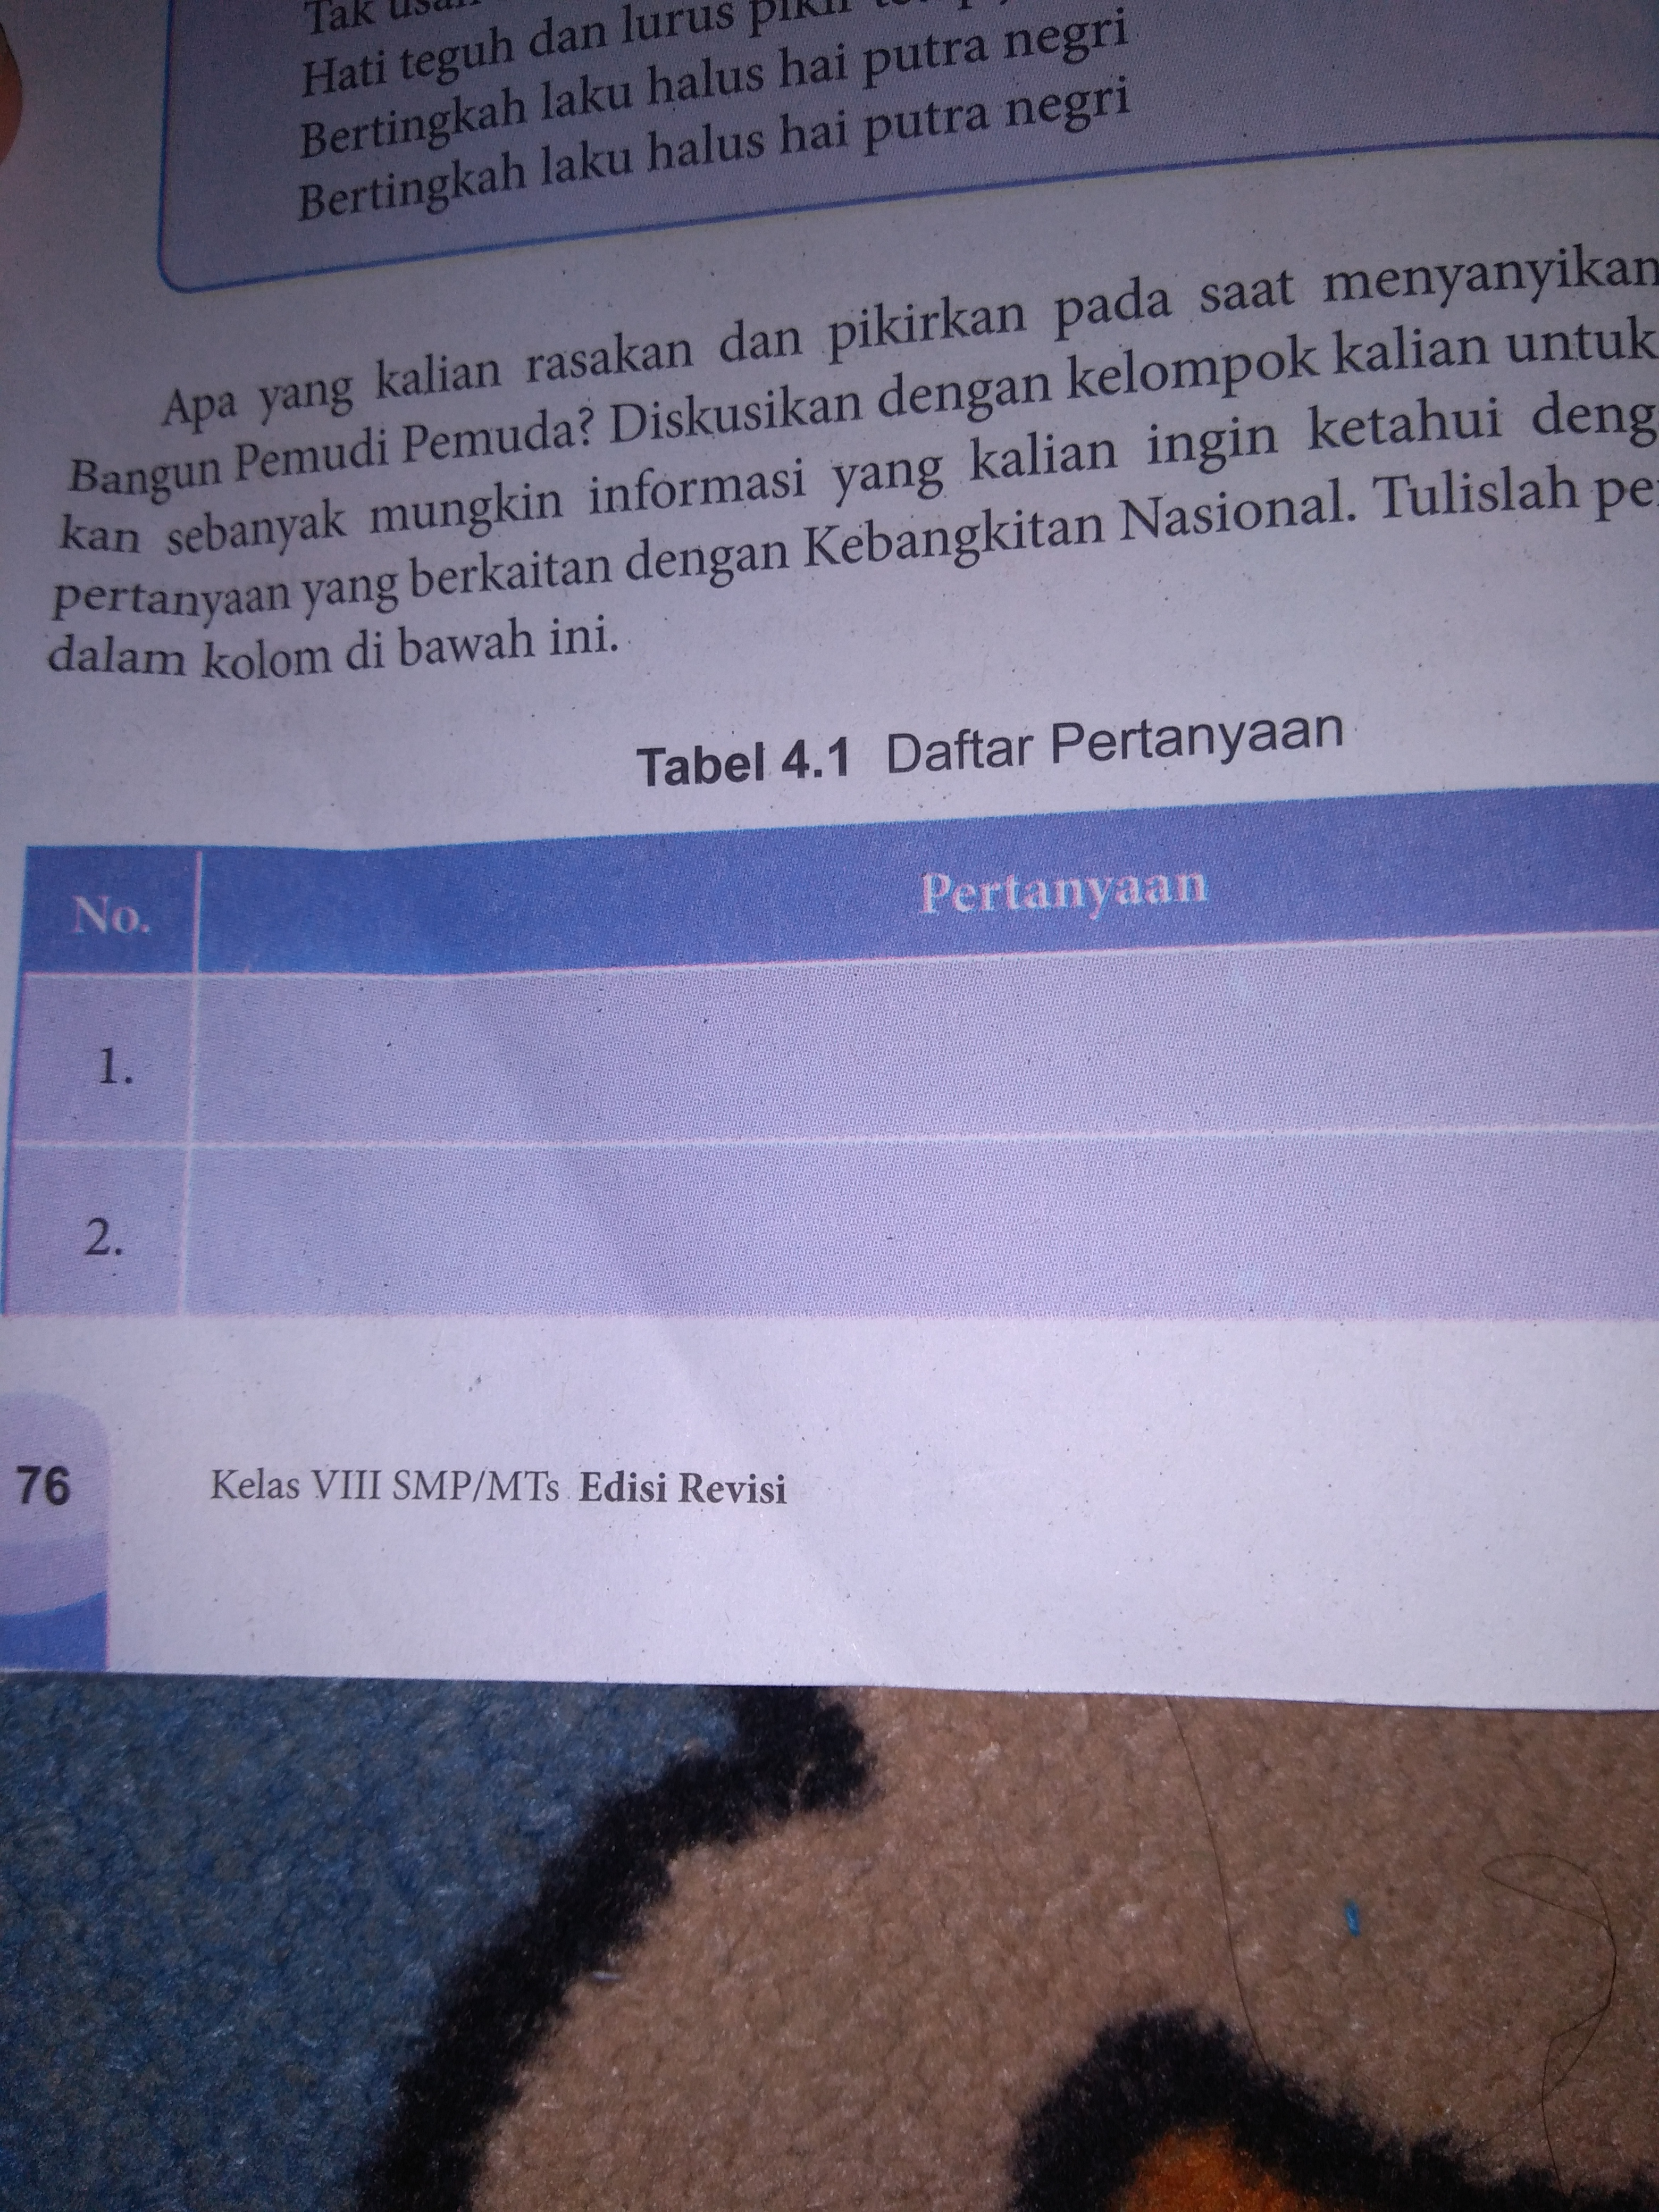 Kunci Jawaban Bab4 Kelas 12 Bab 4 Tugas Kelompok 4 1 Ilmusosial Id